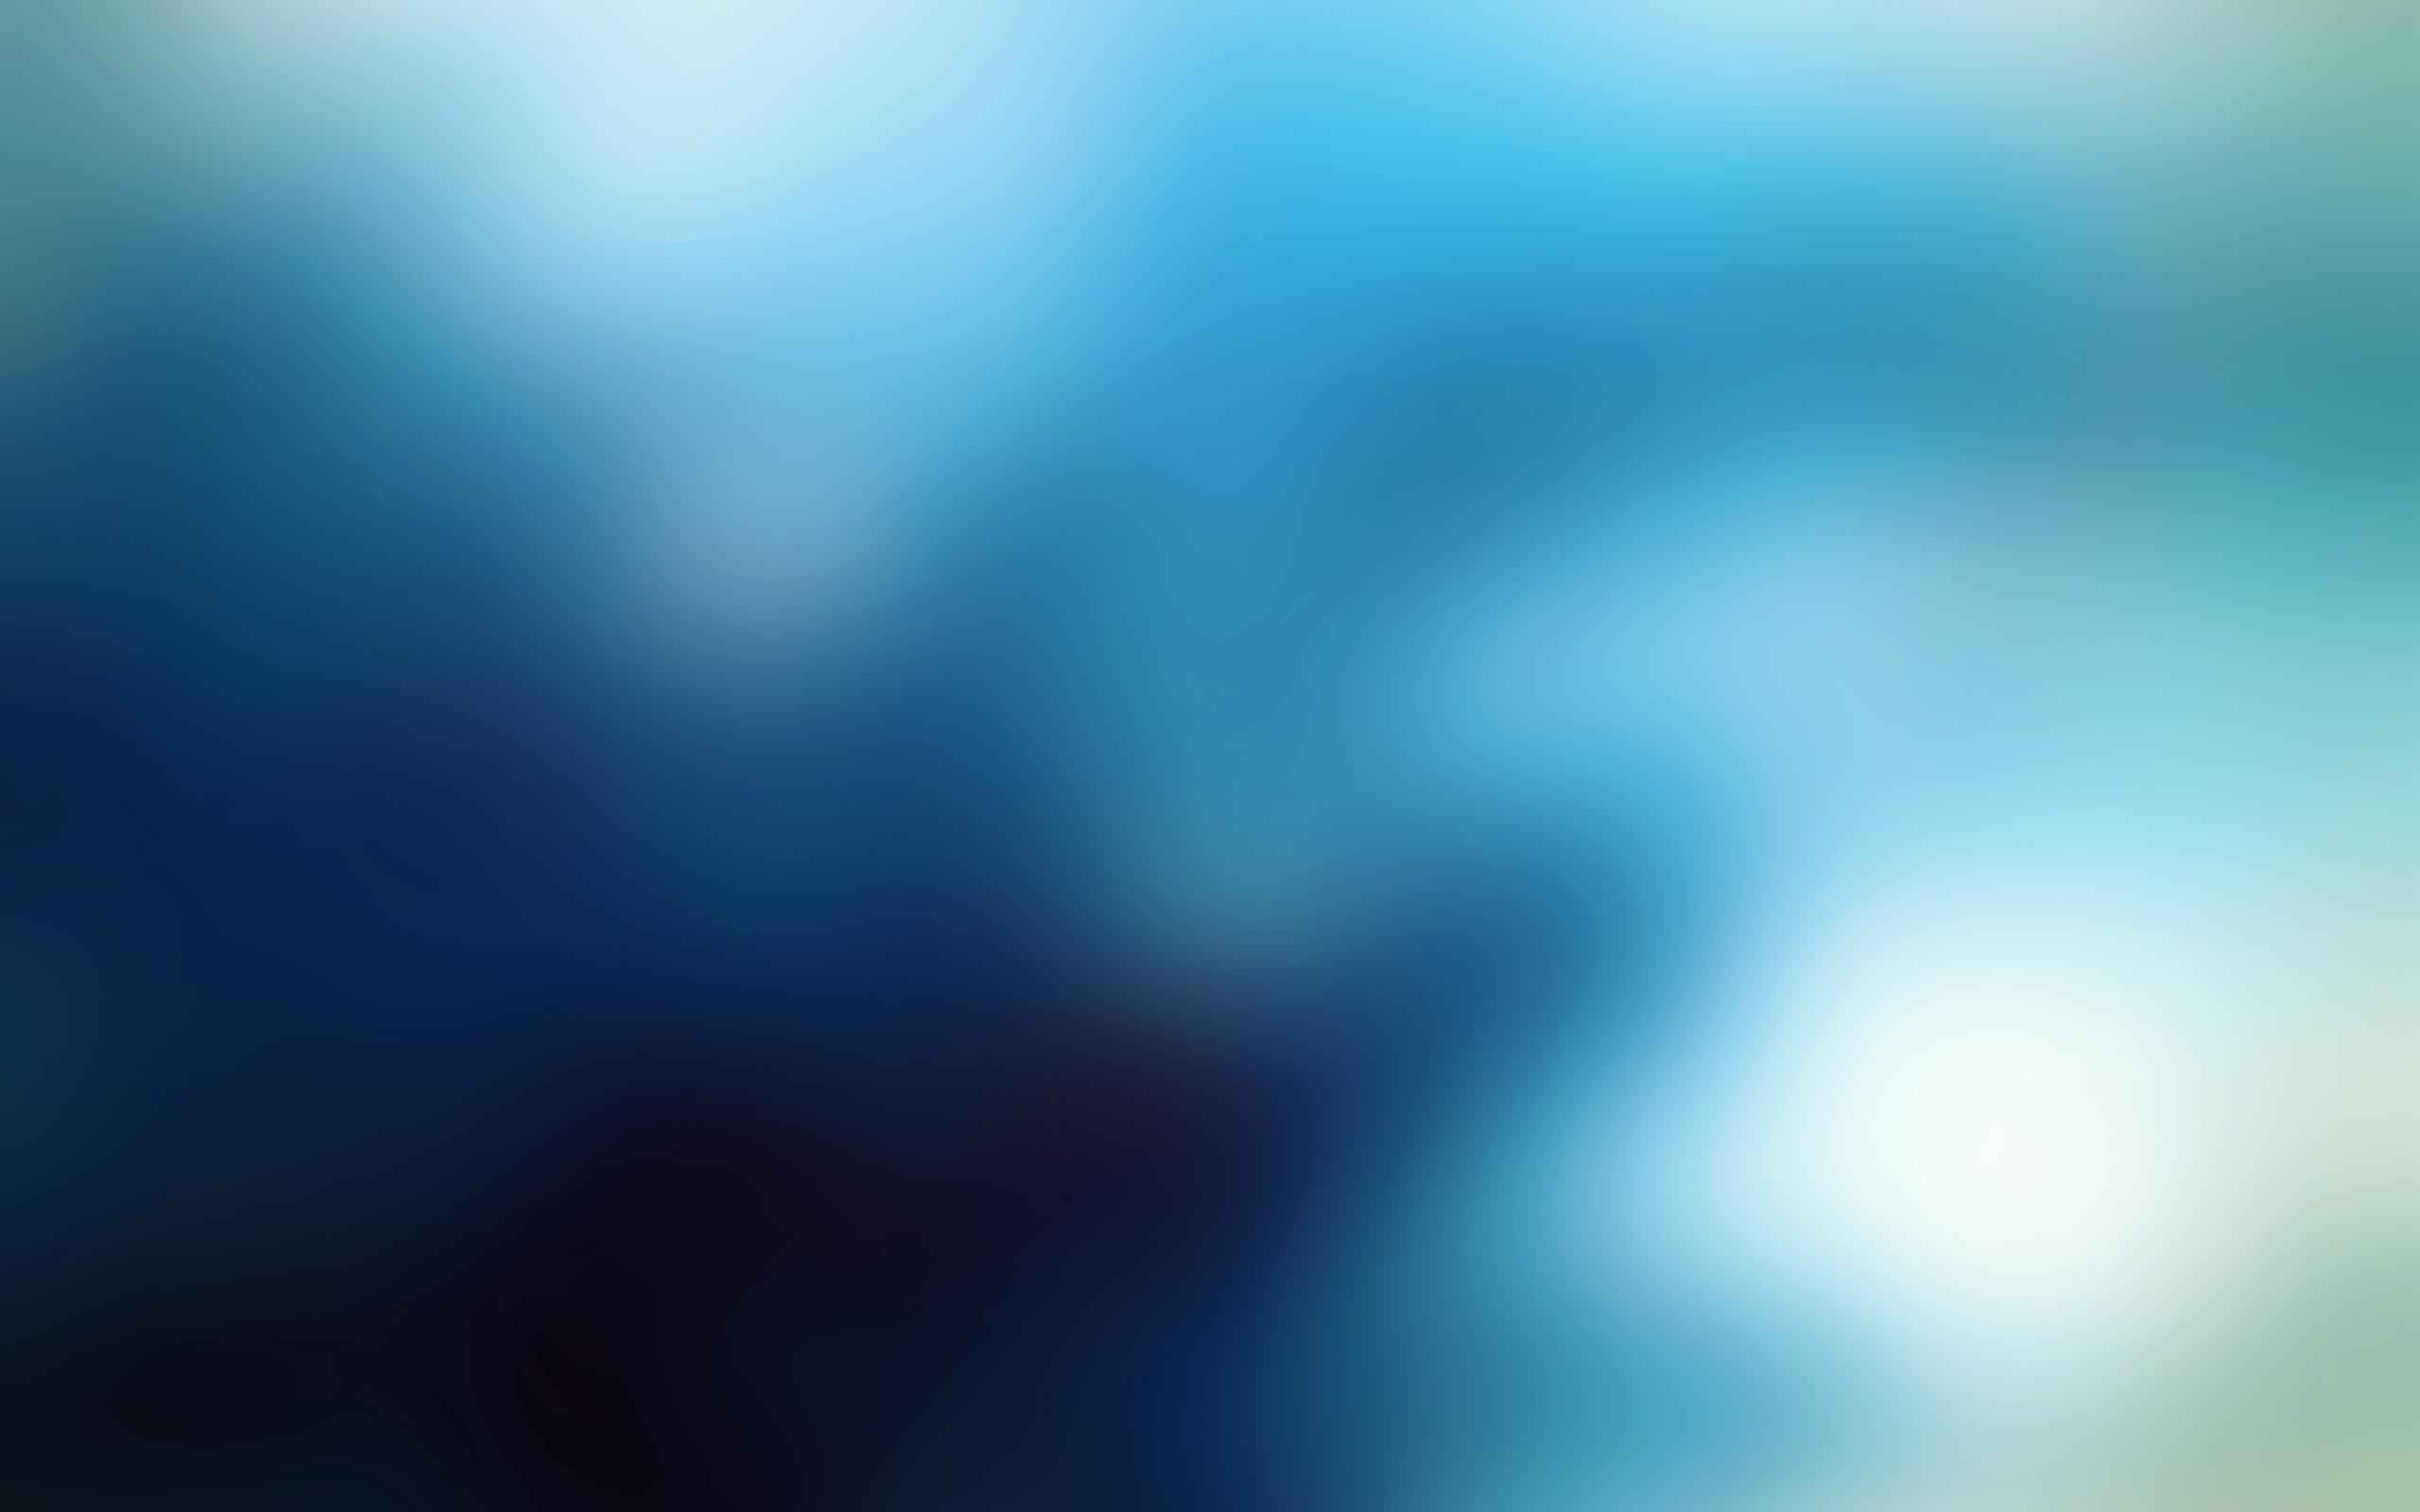 light blue wallpaper 7835